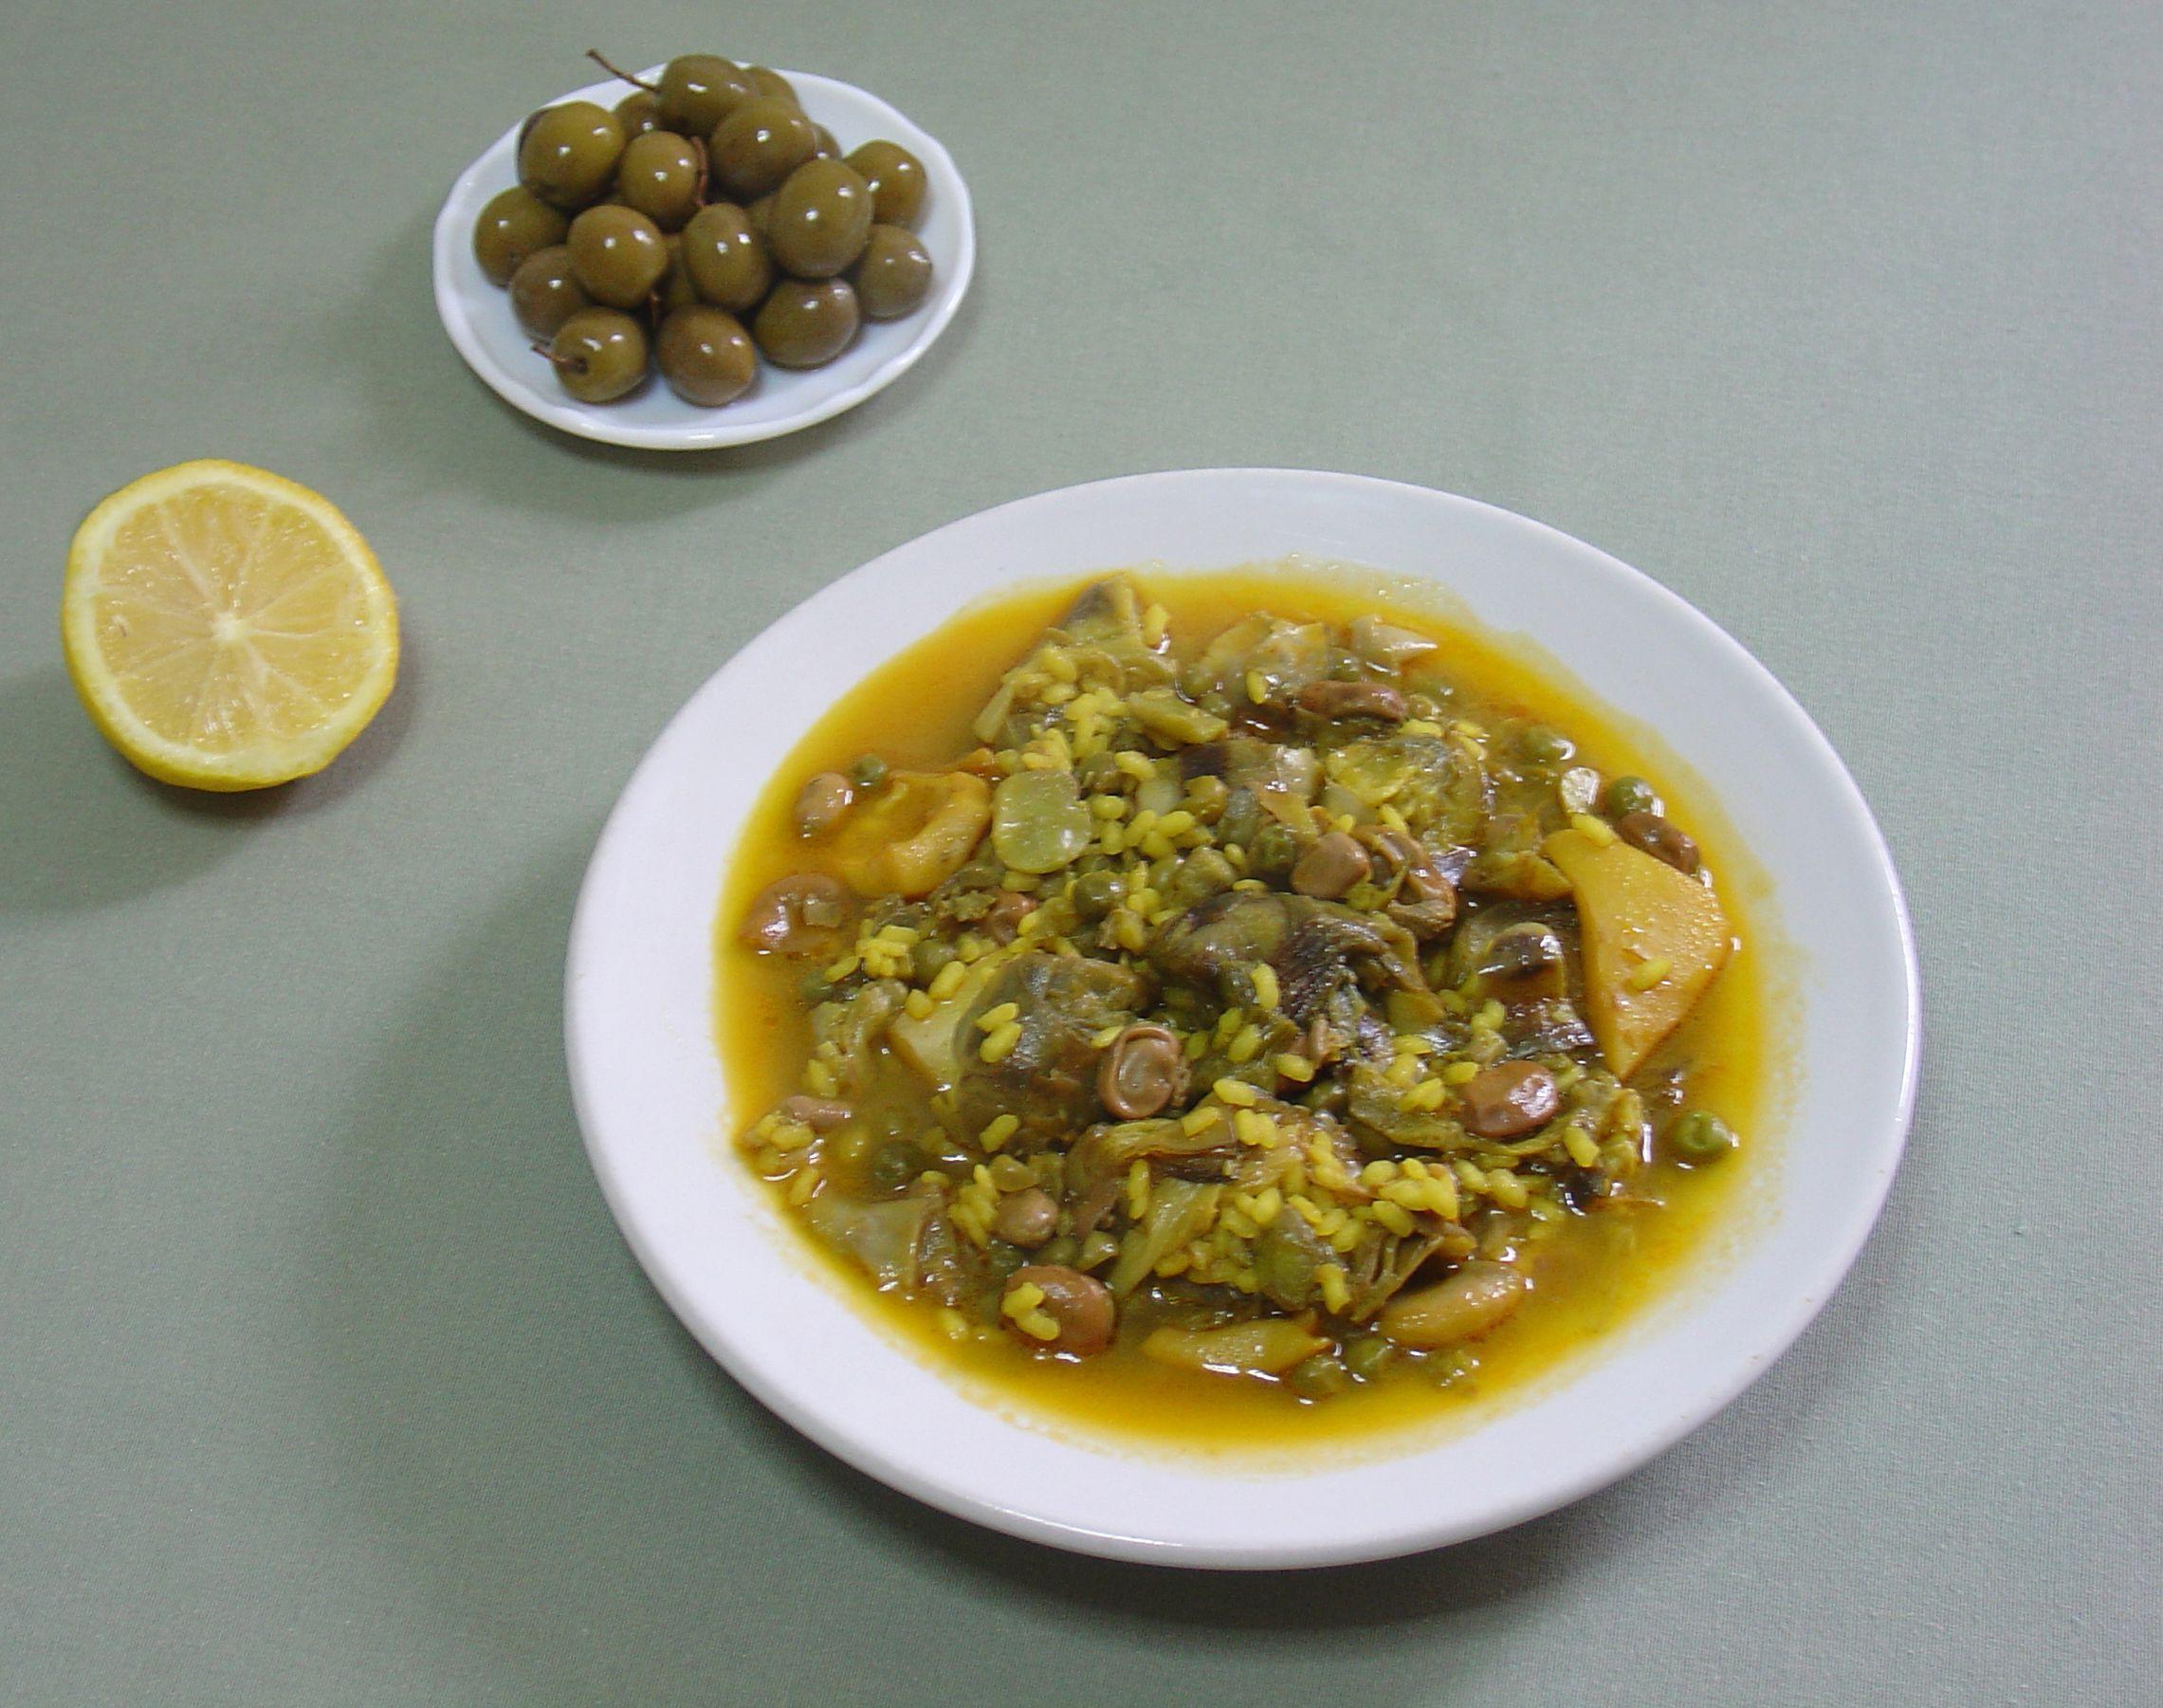 Cocina Guisantes Recetas De Cocina Habas